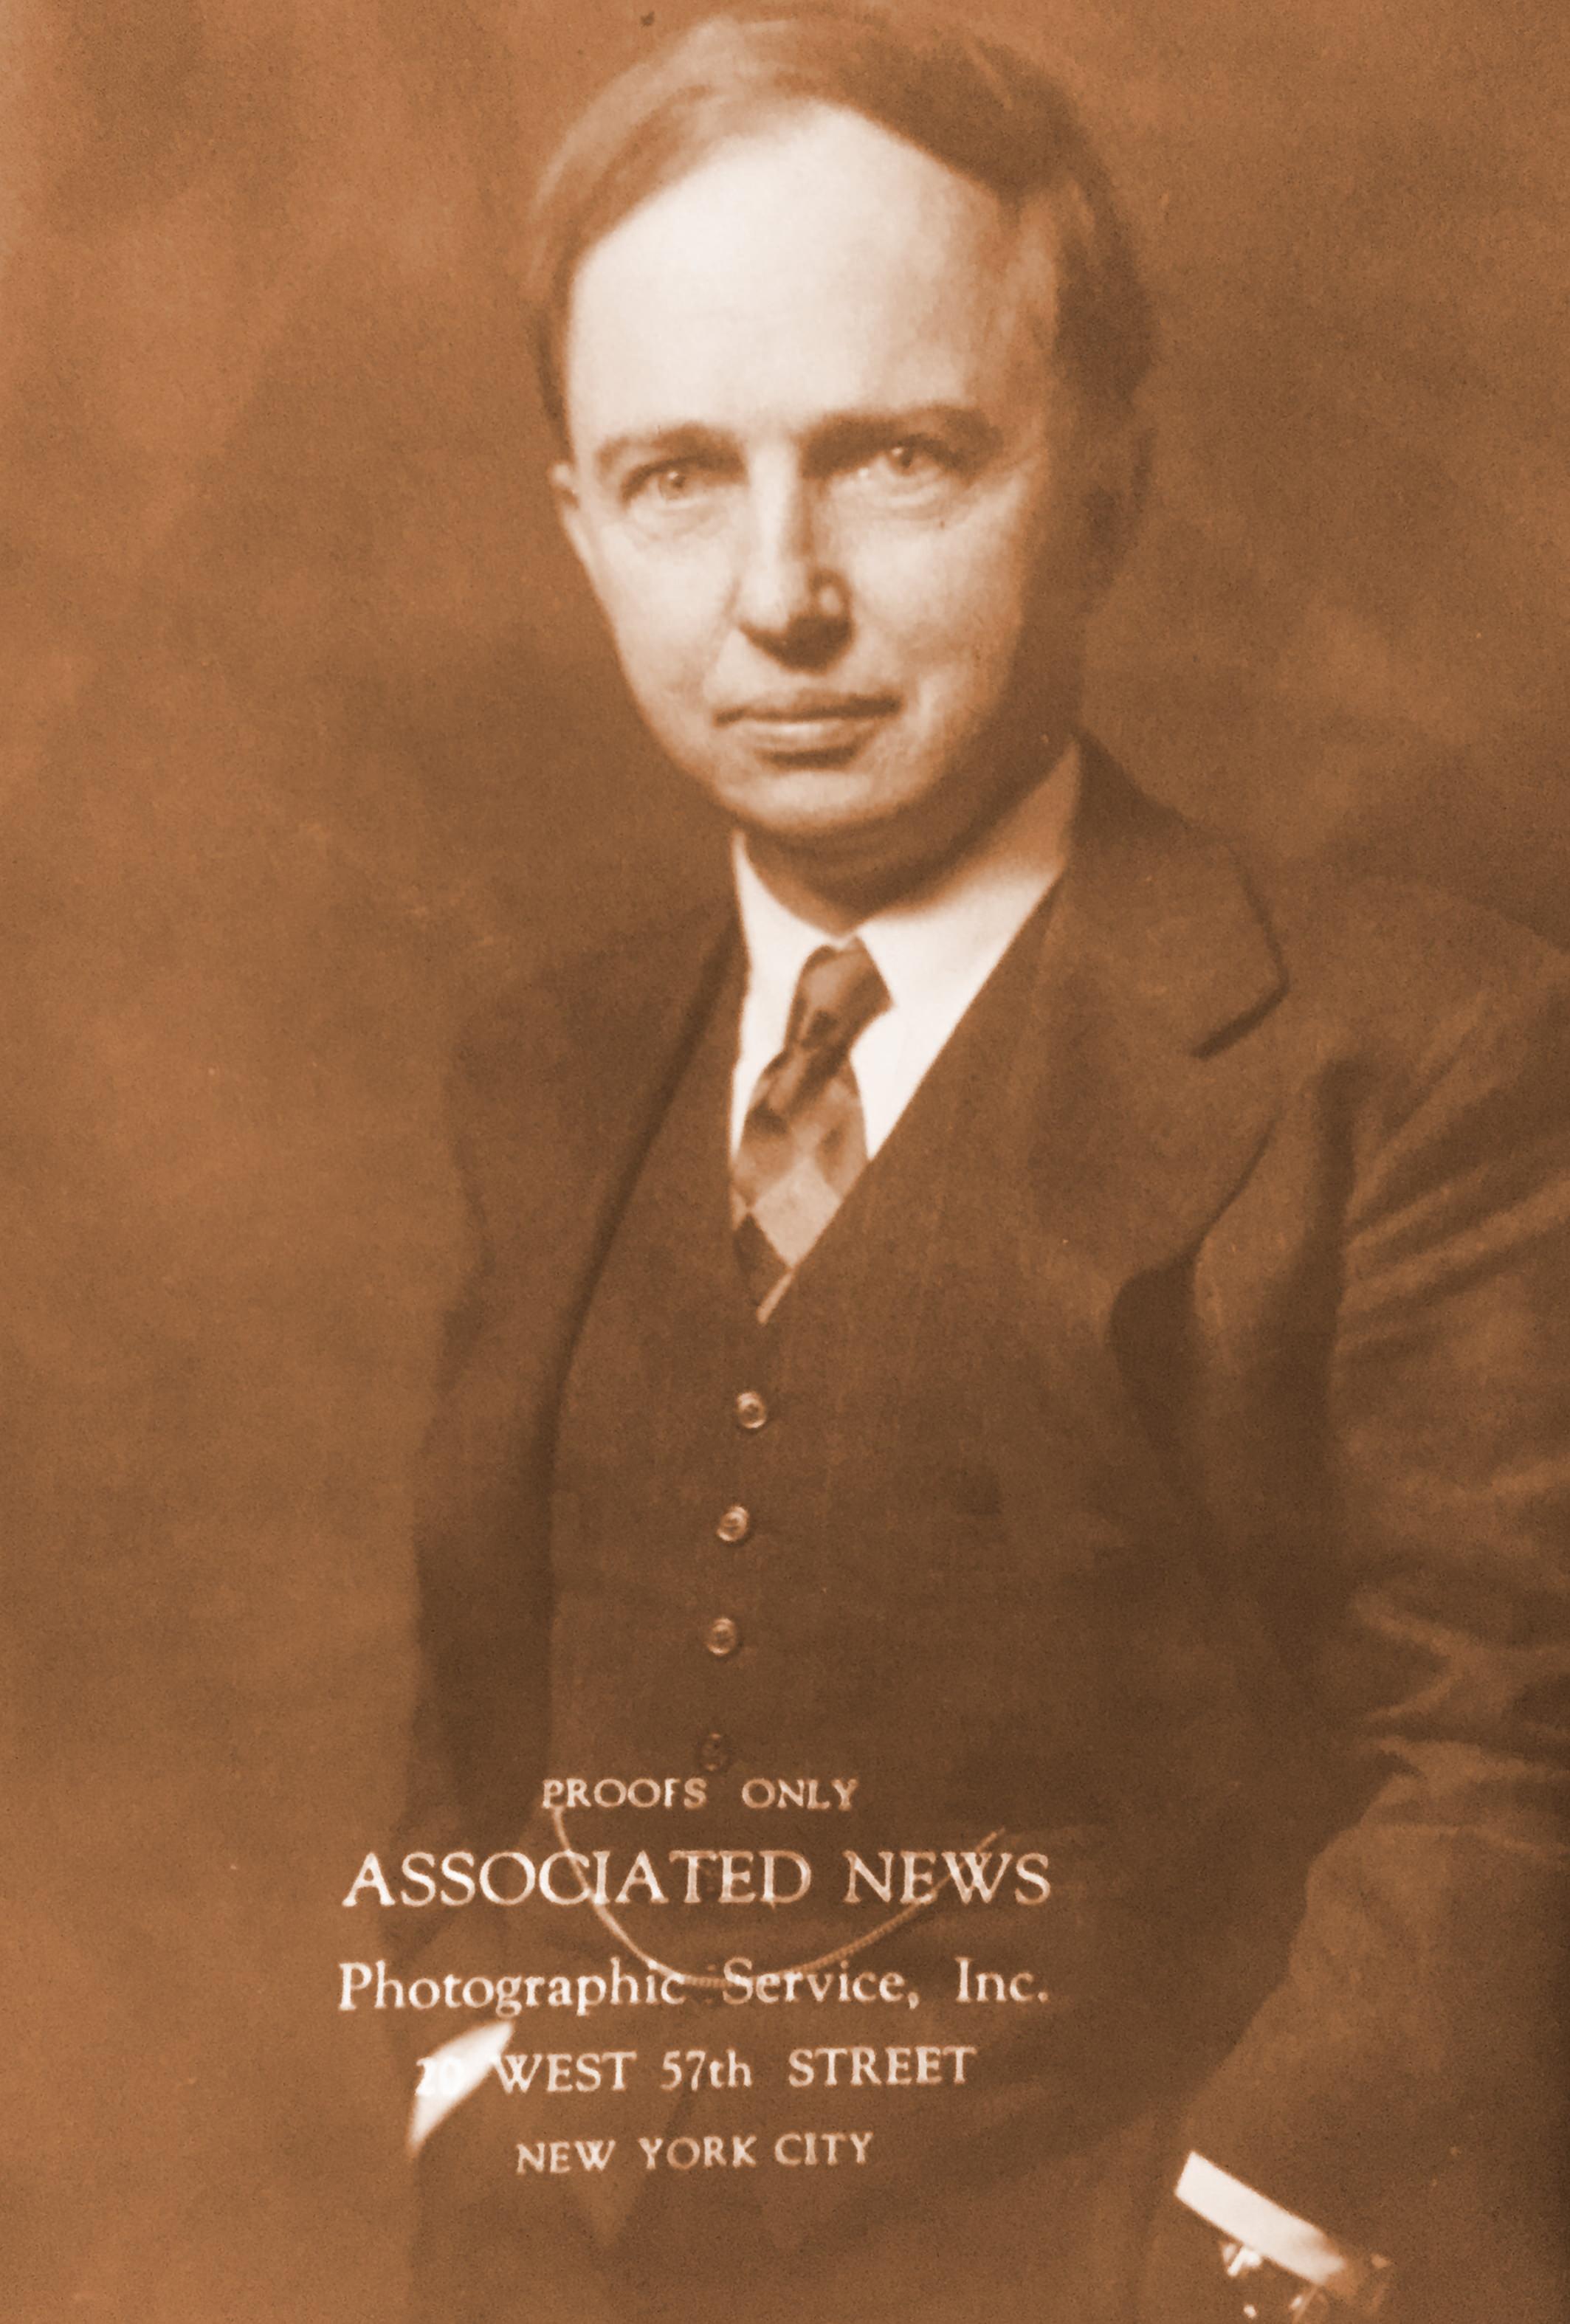 Harlow Shapley Press Photo   Photo source: Harvard University Archives